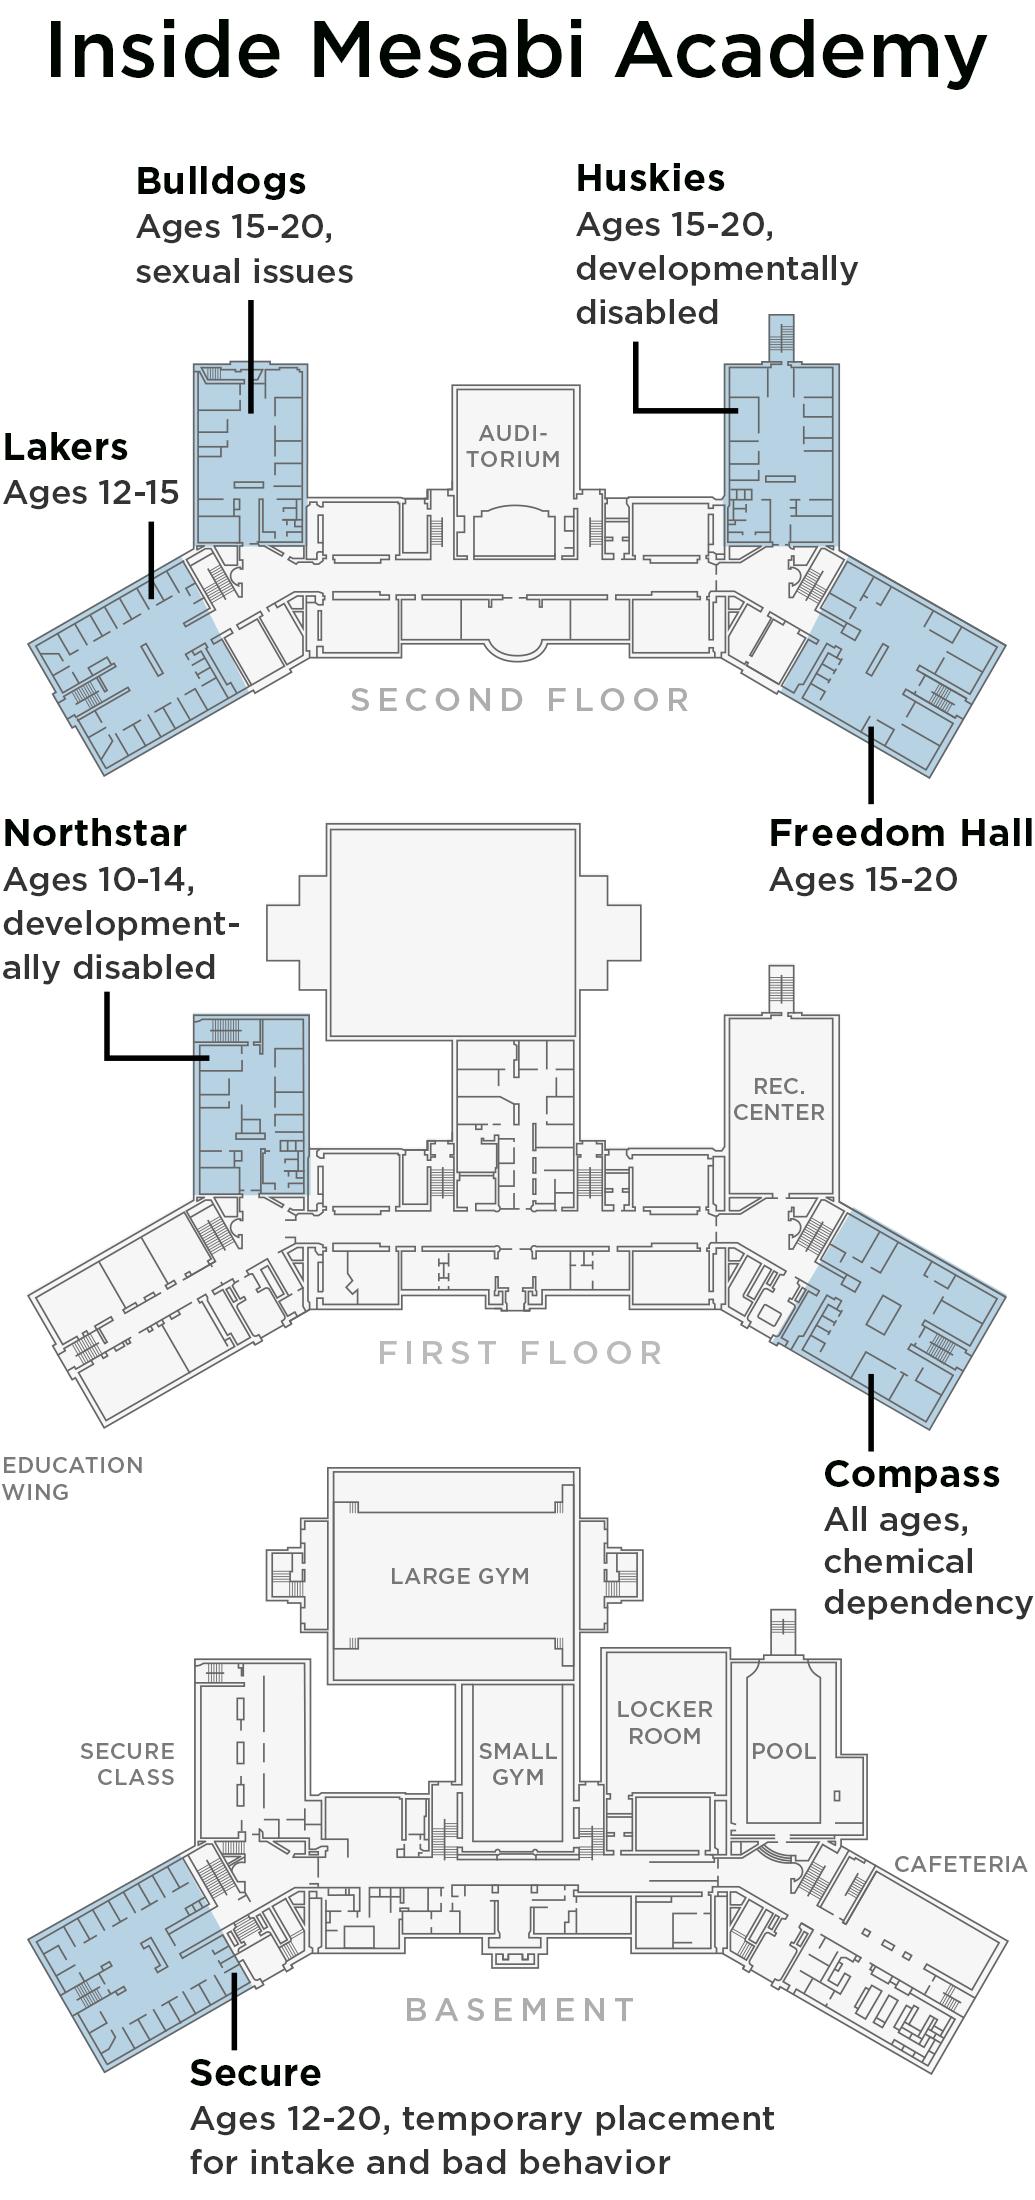 Mesabi Academy floor plan